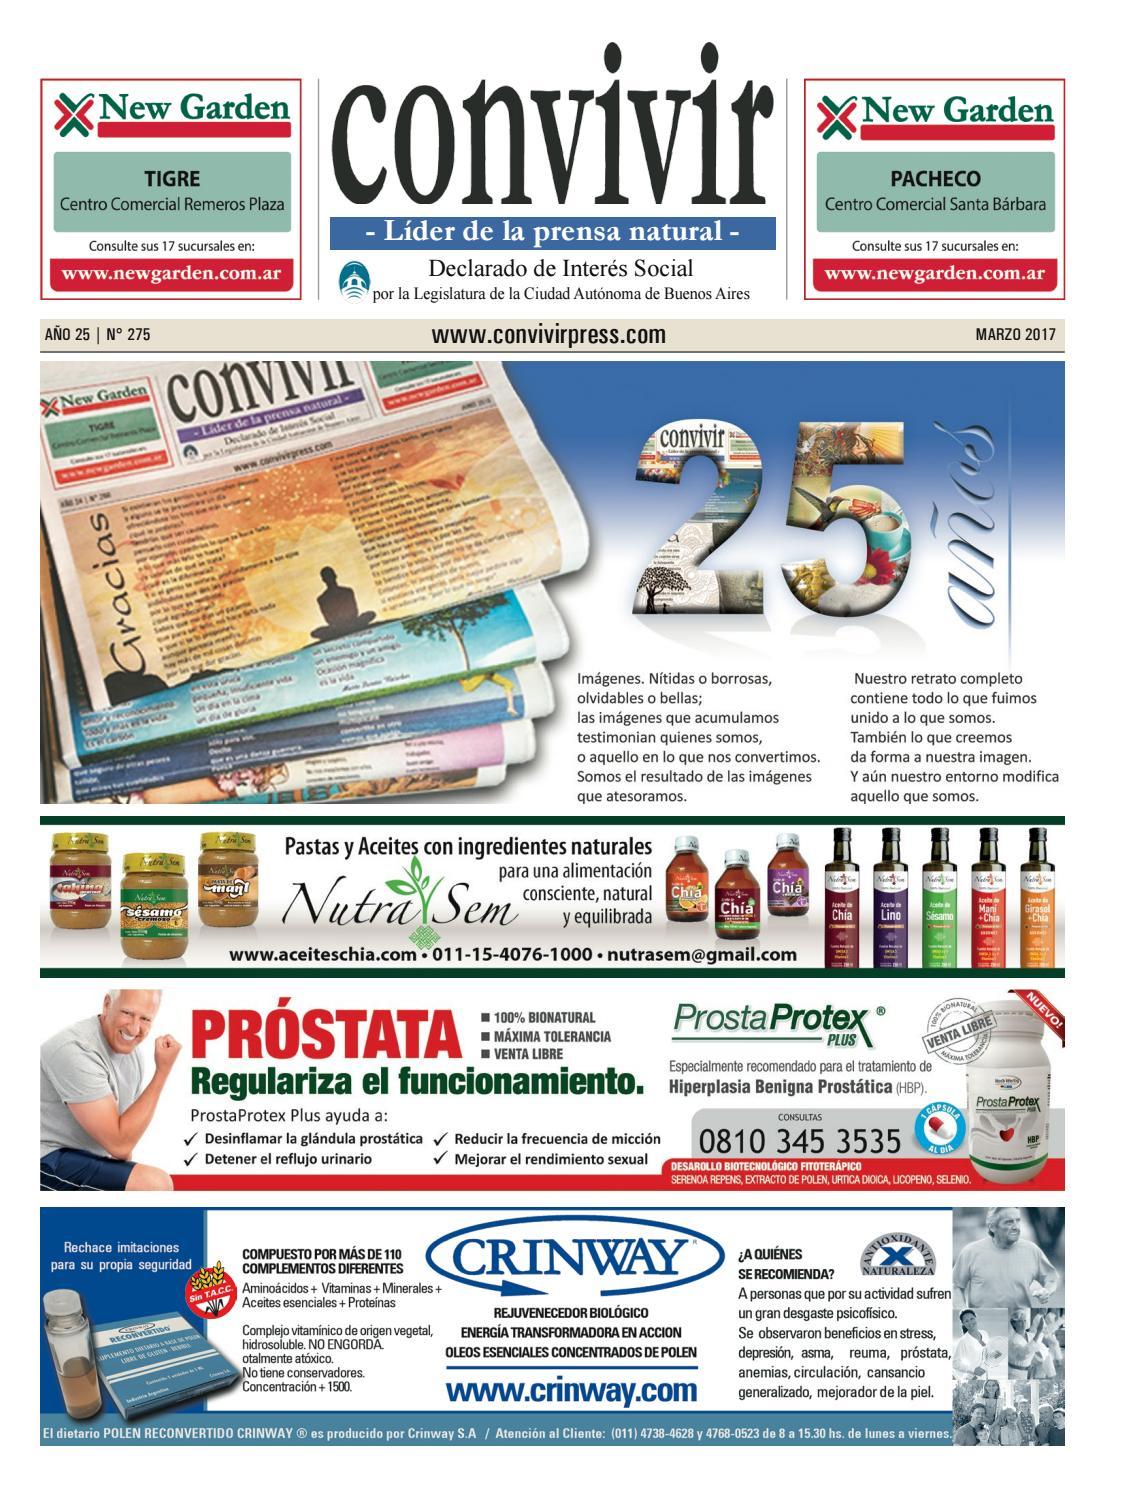 suplementos dietarios para adelgazar argentina preciosos